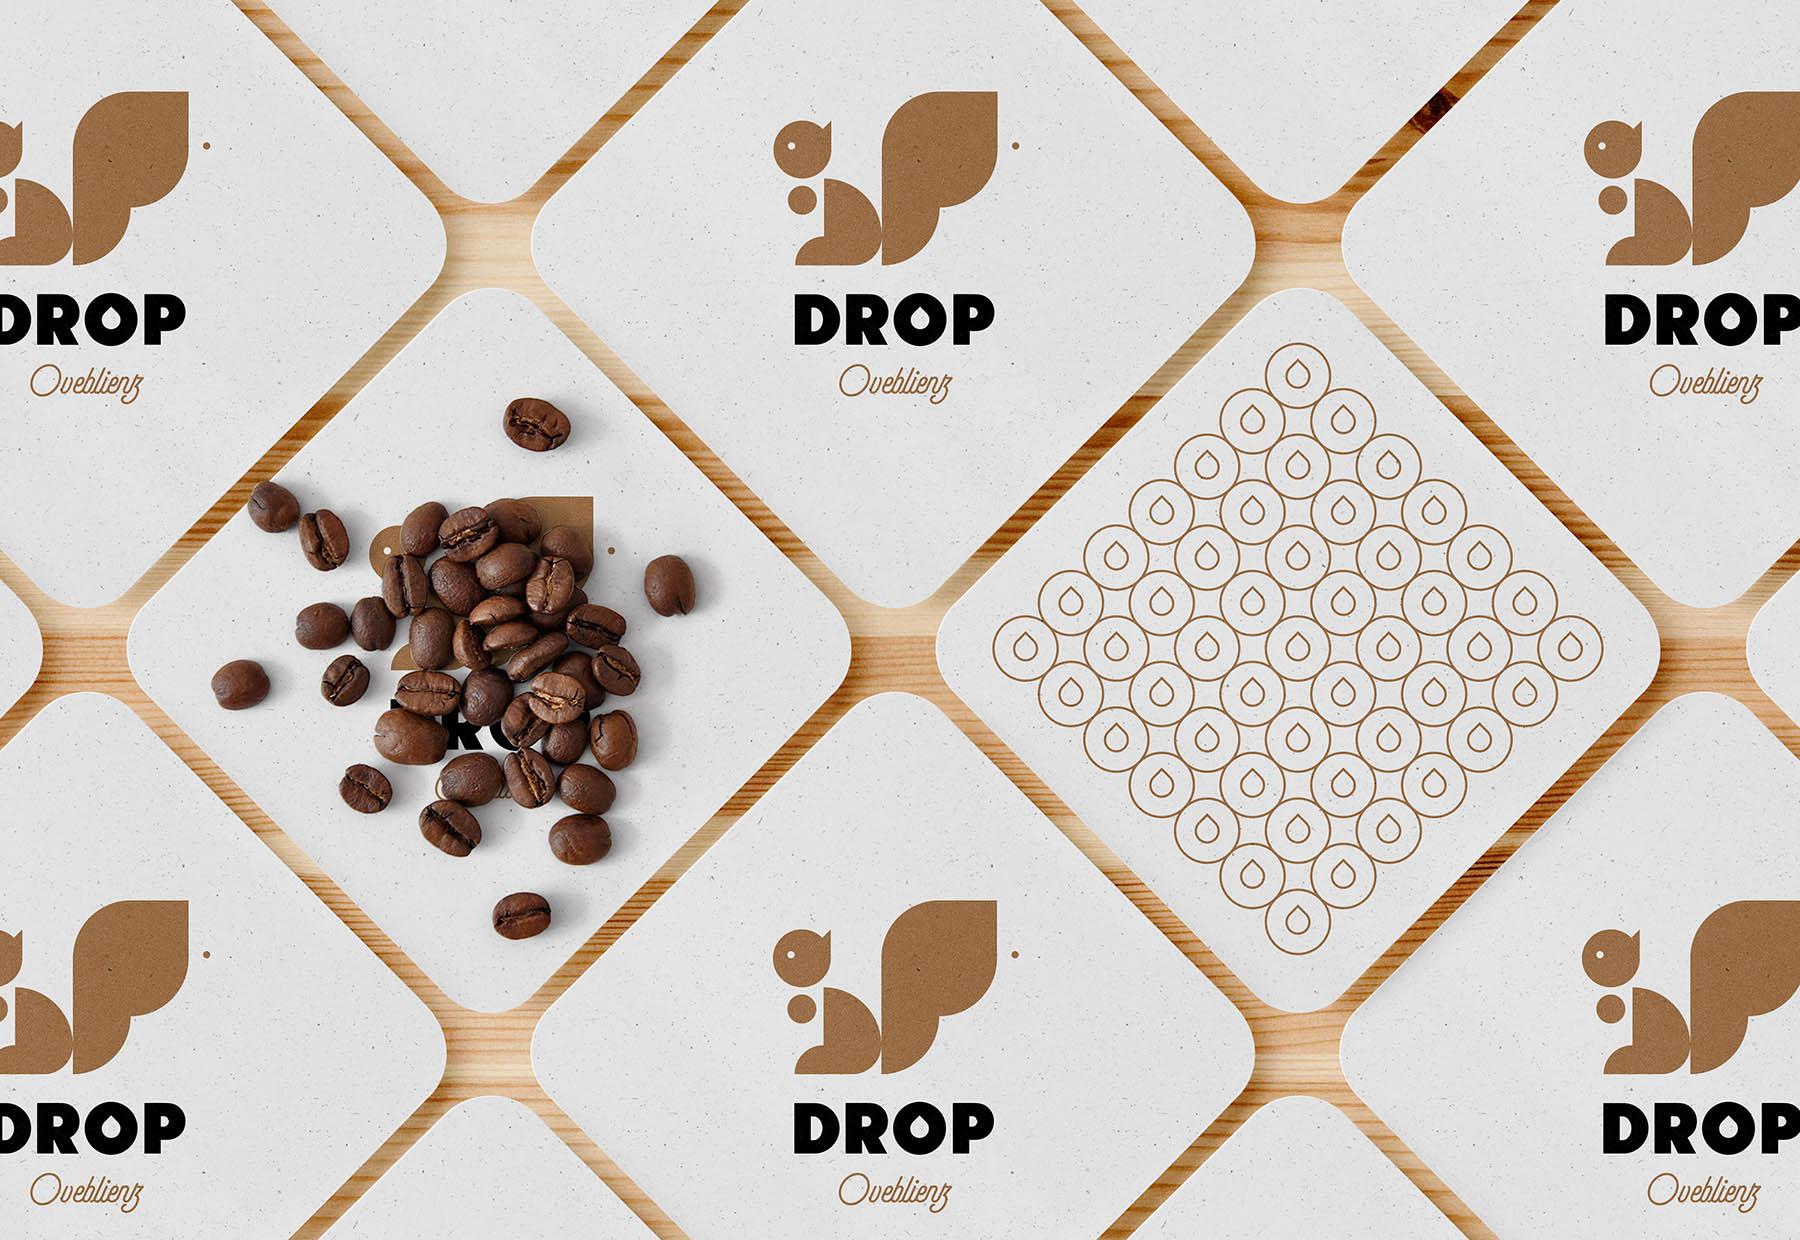 beer coaster graphic design